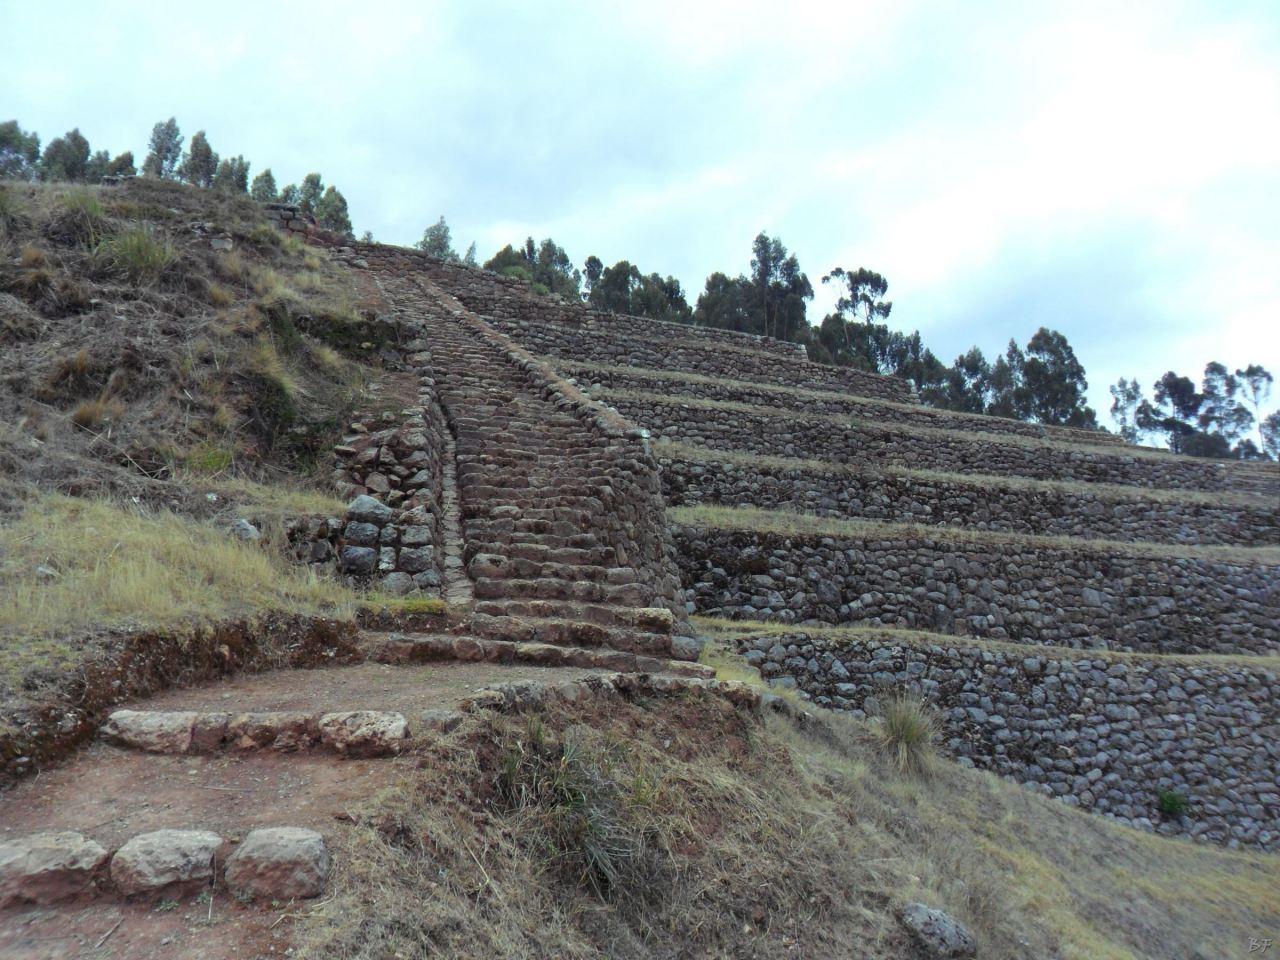 Chinchero-Mura-Poligonali-Piramide-Urubamba-Peru-75